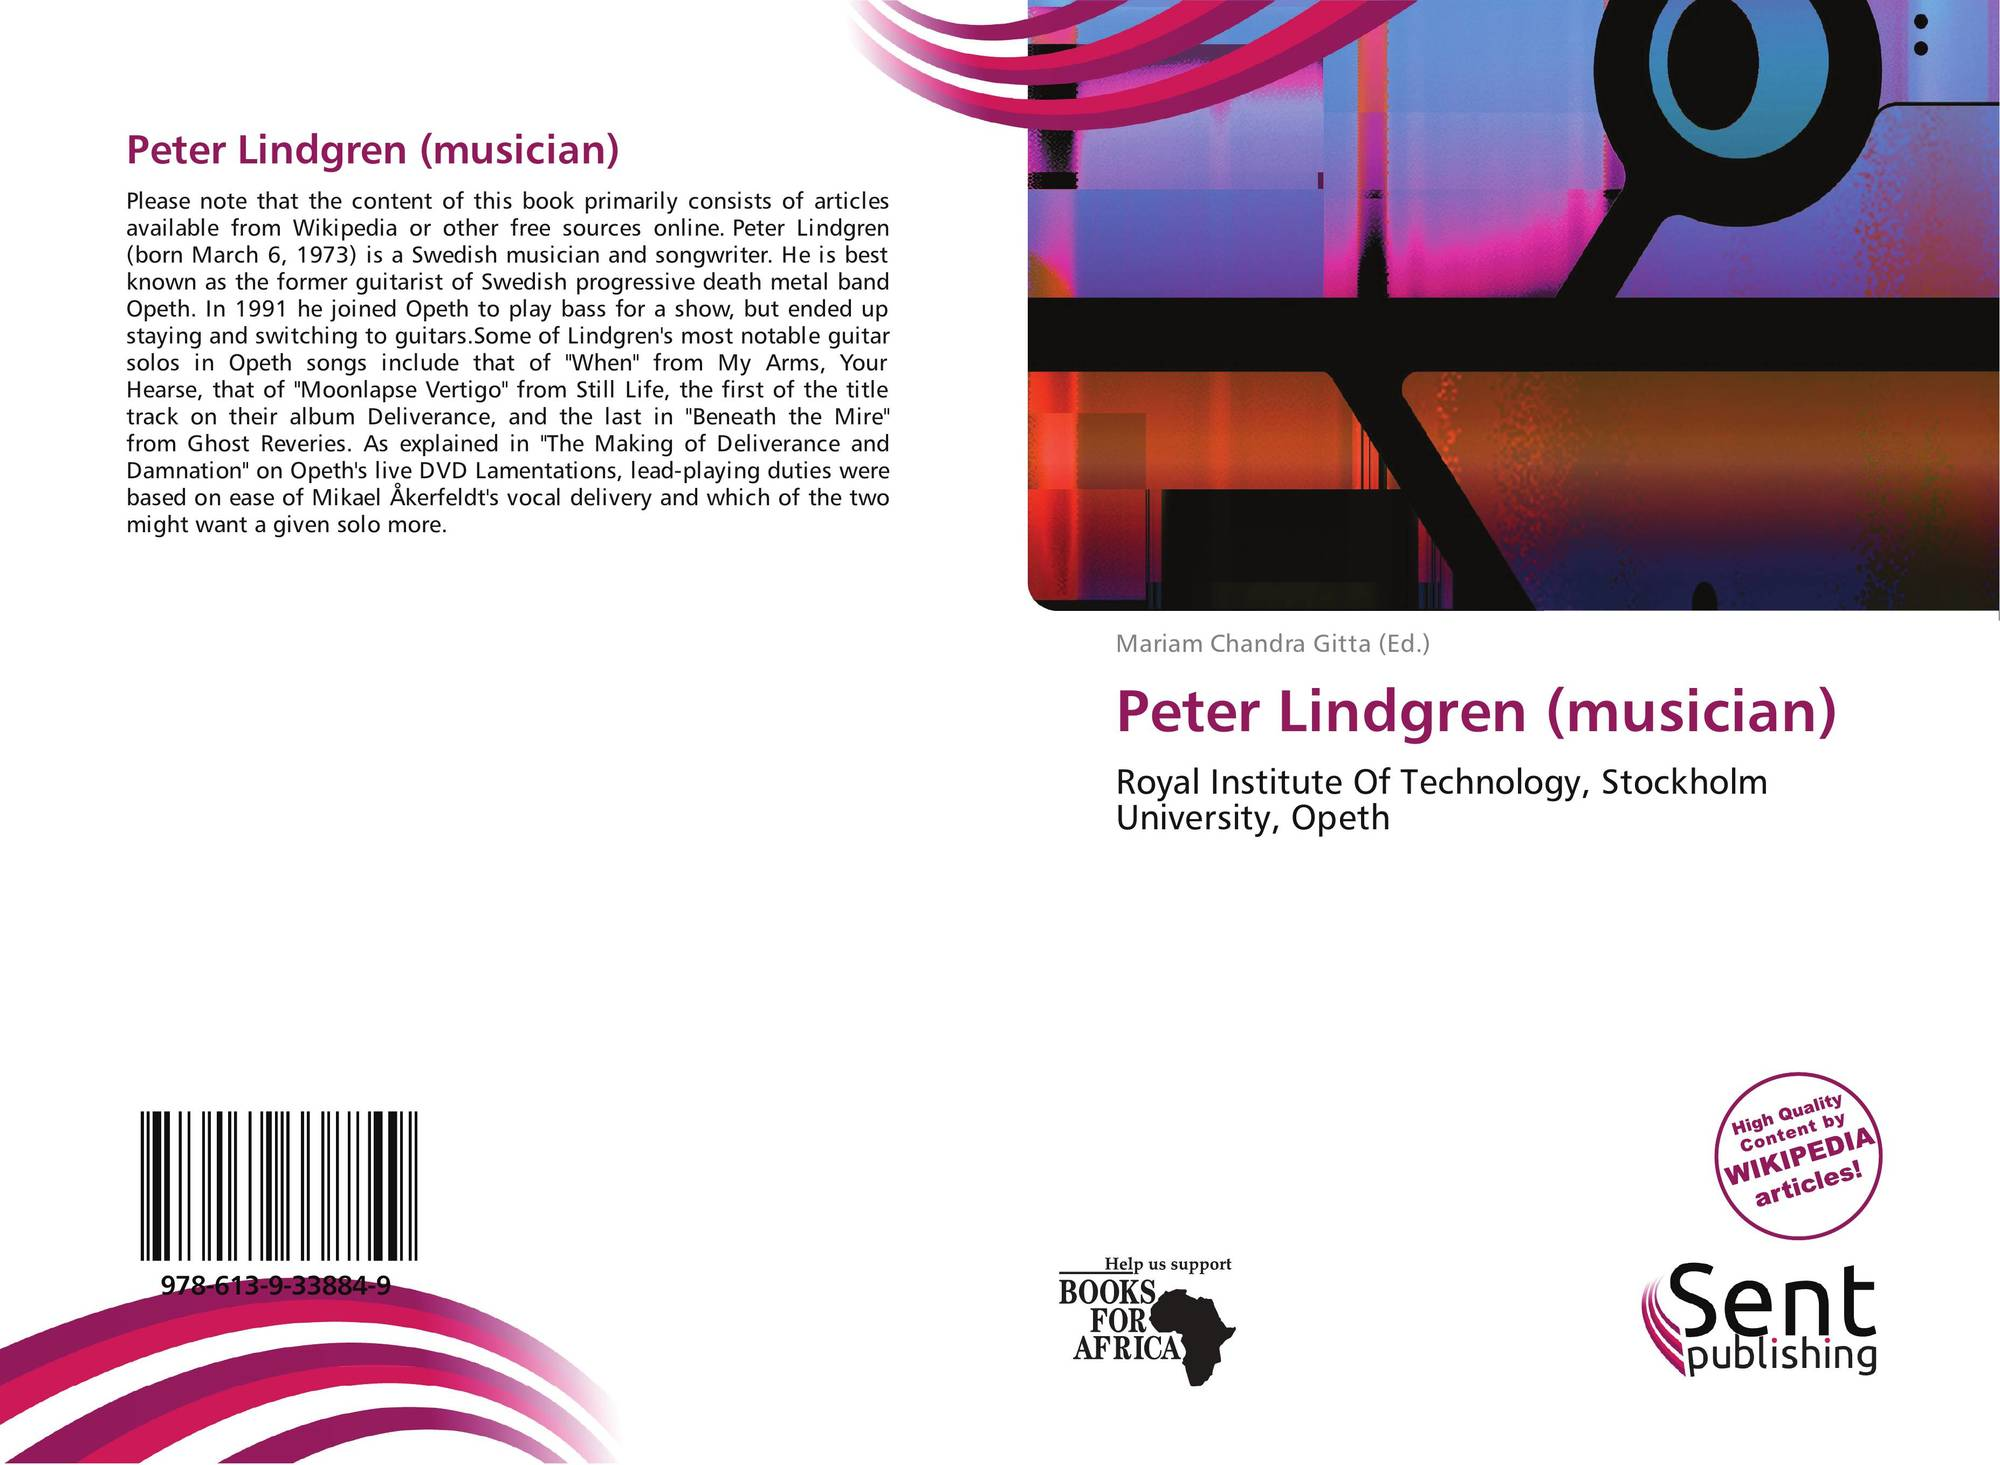 Peter Lindgren Musician 978 613 9 33884 9 6139338840 9786139338849